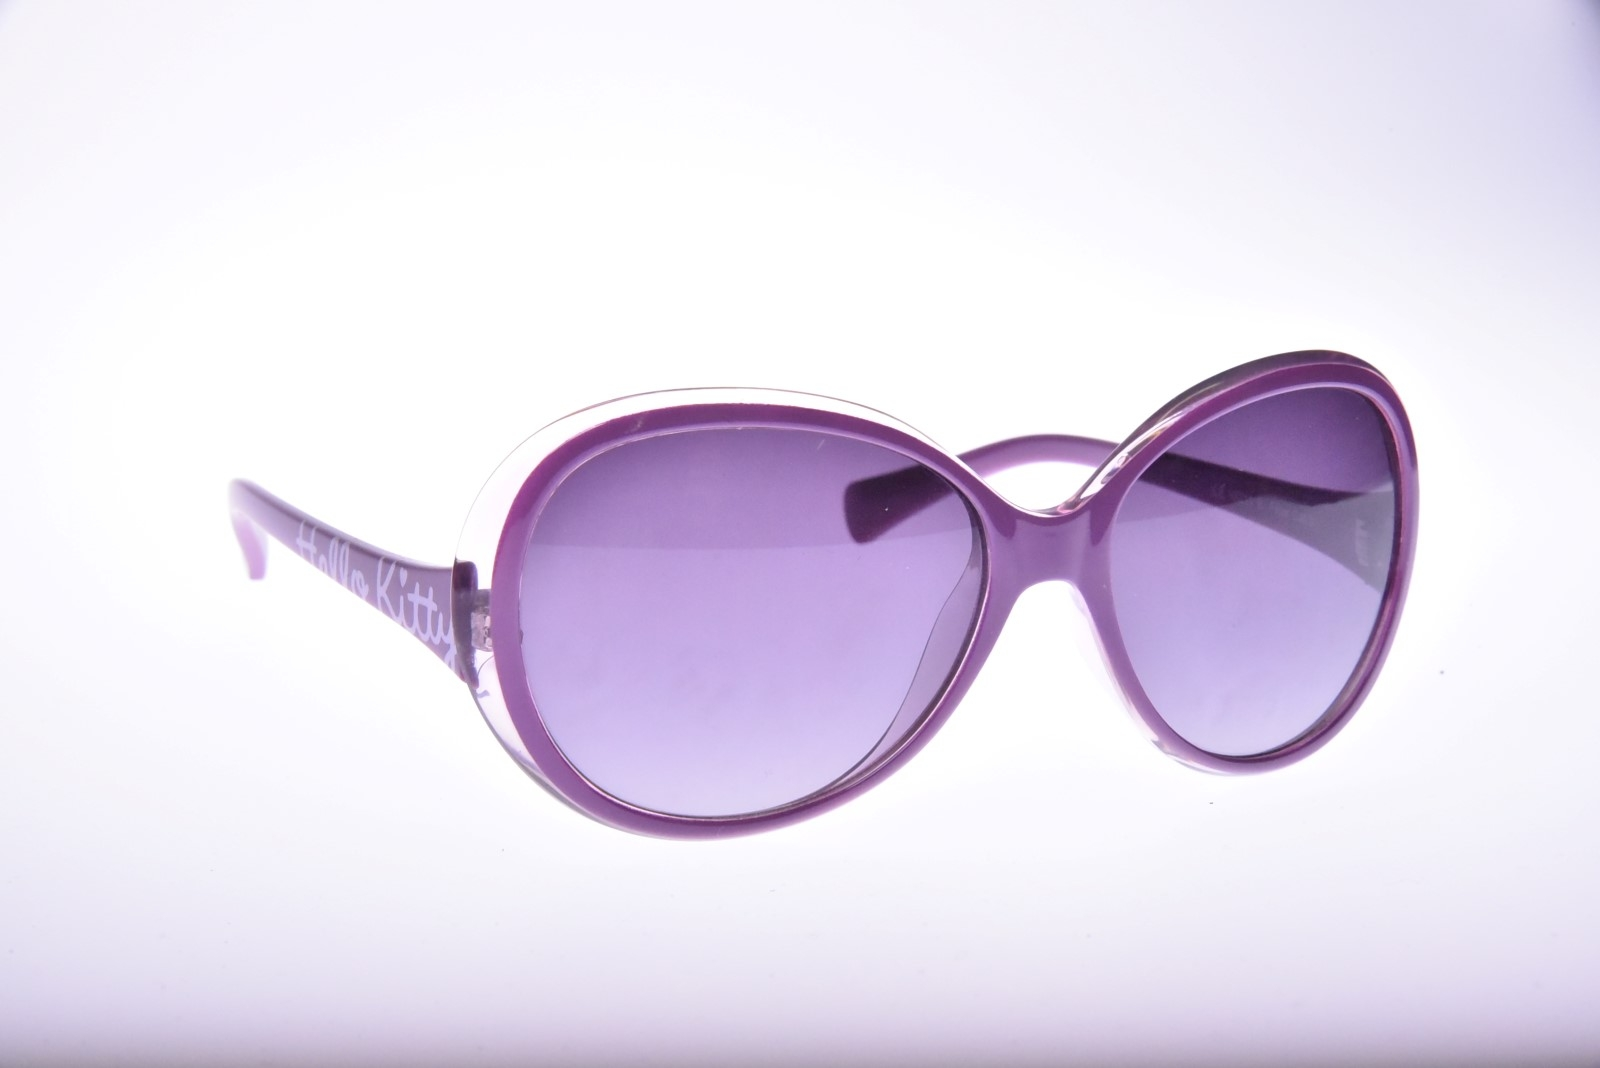 Polaroid Hello Kitty K6211B - Slnečné okuliare pre deti 8-12 r.